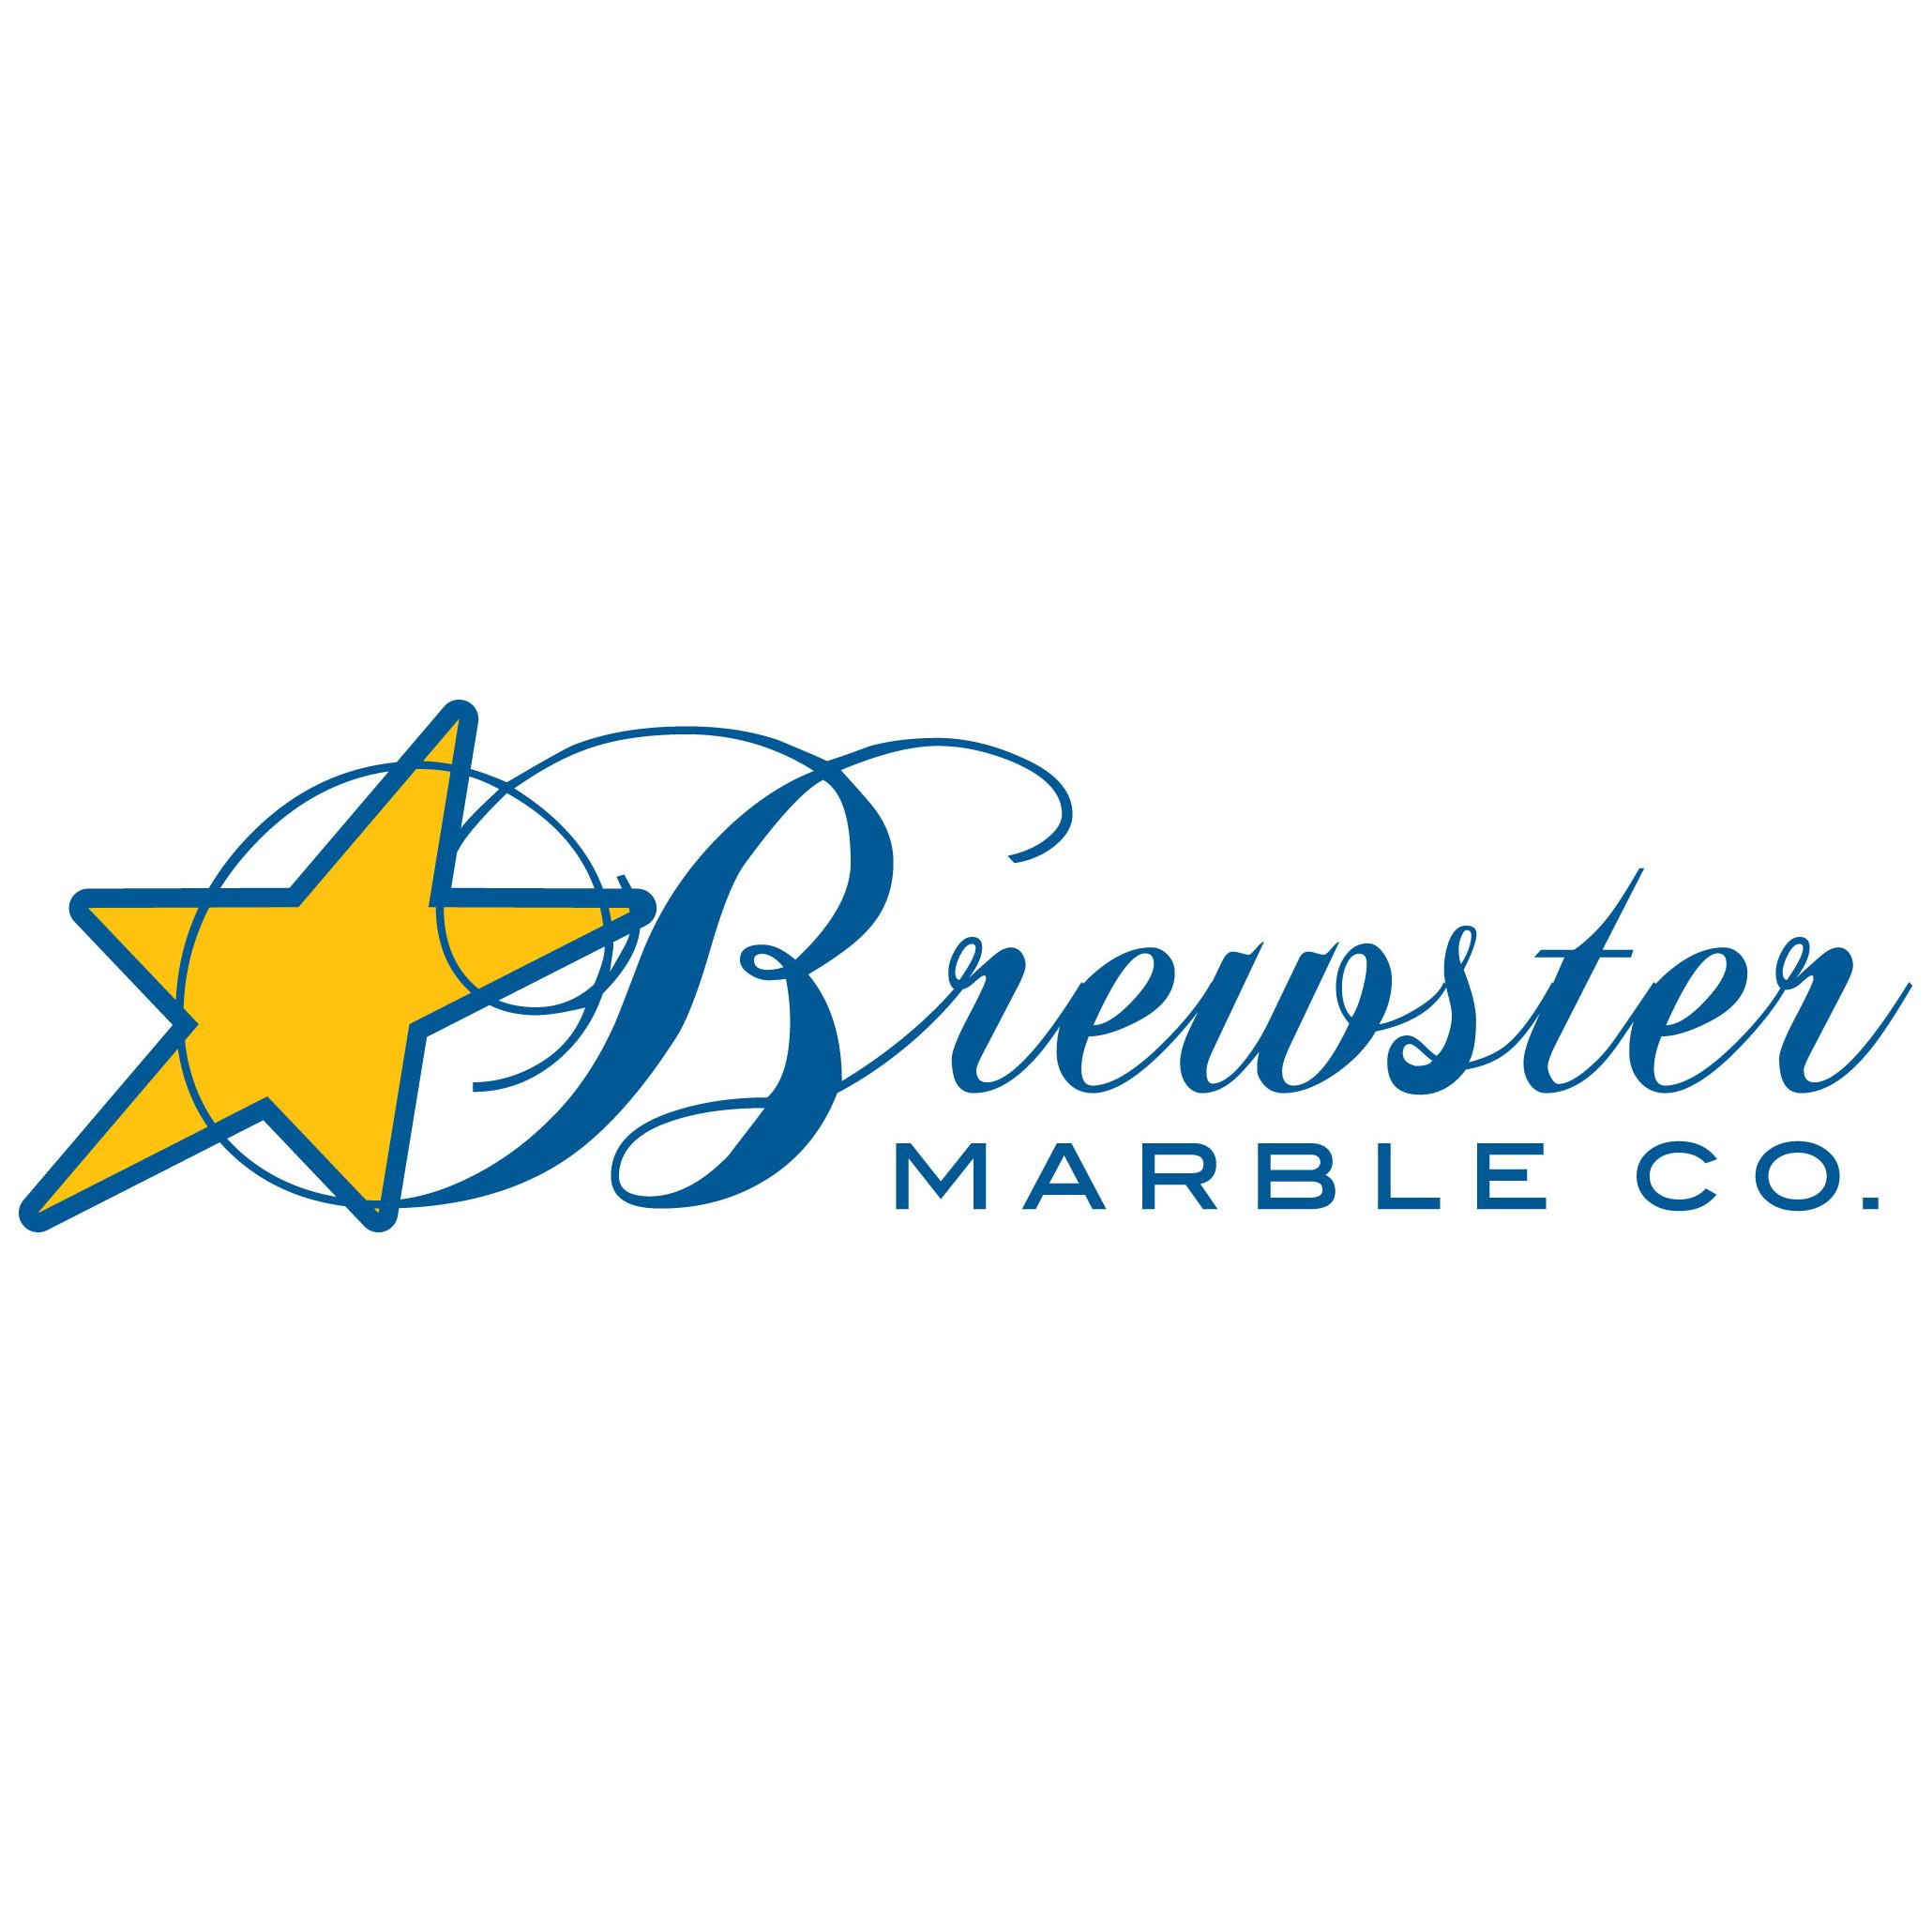 Brewster Marble